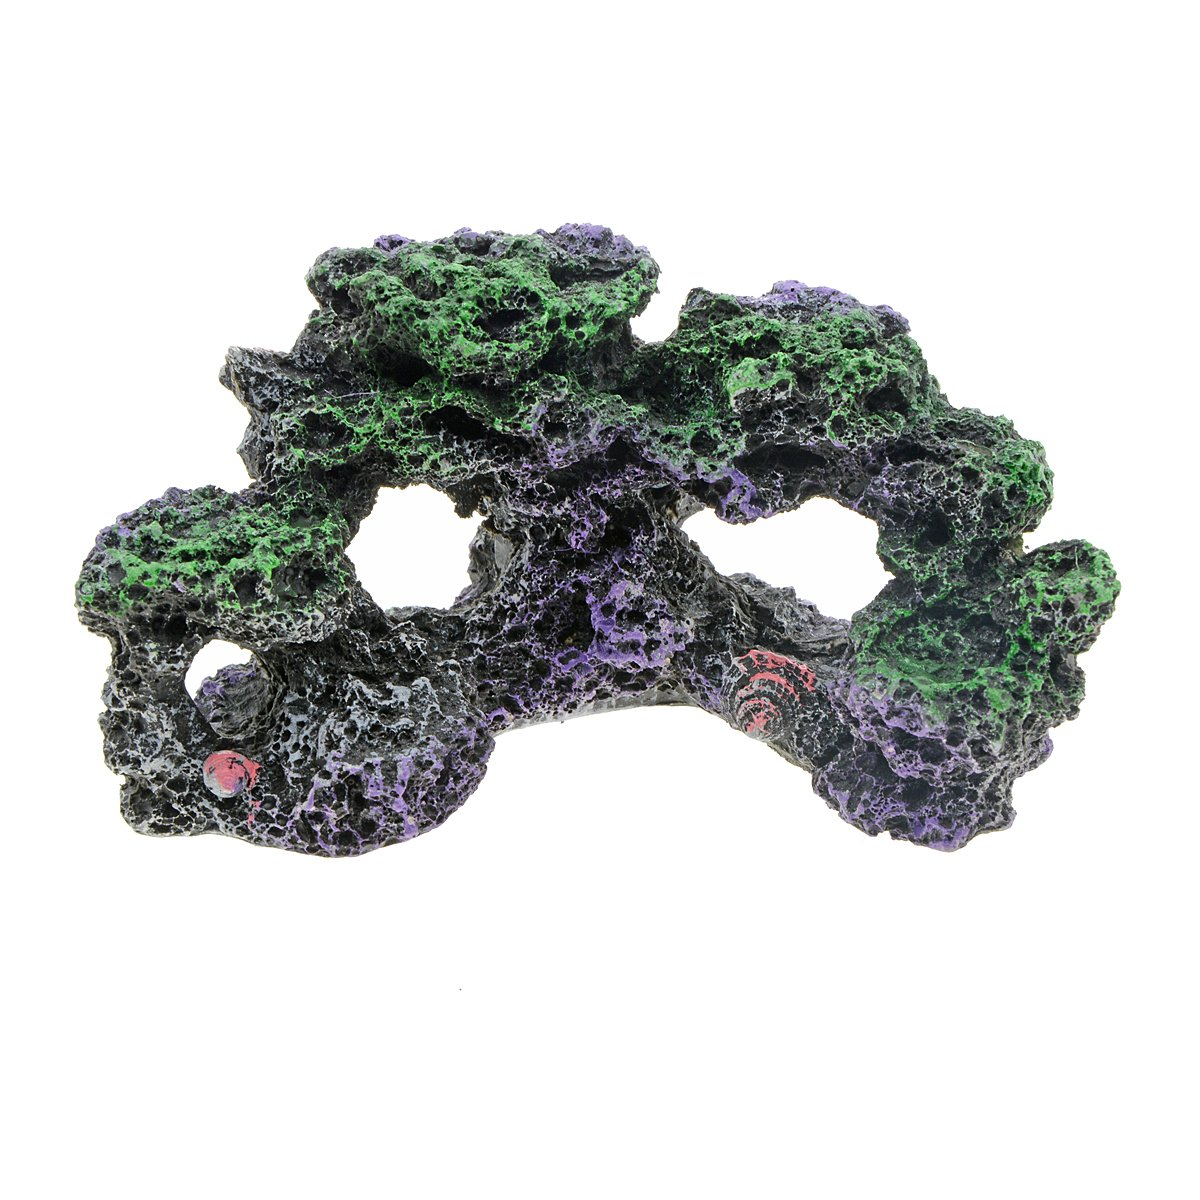 Saim Mountain View Aquarium Coral Reef Rockery Hiding Cave Stone Landscape Decor Fish Tank Ornaments